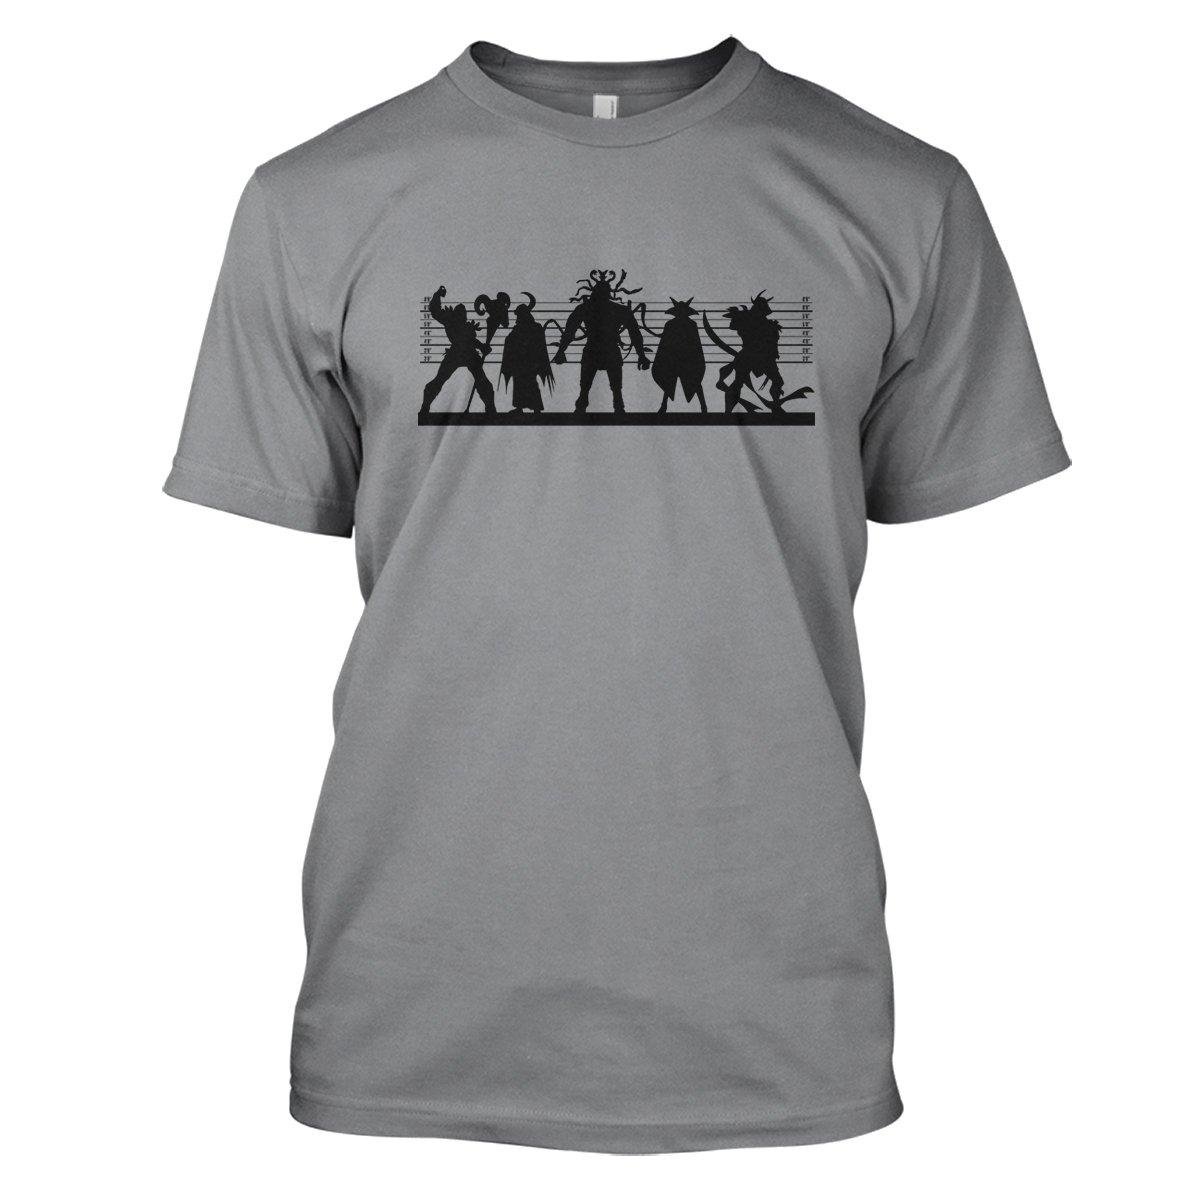 Retro Cartoon Villain Suspects Mens Movie T-Shirt Large Grey